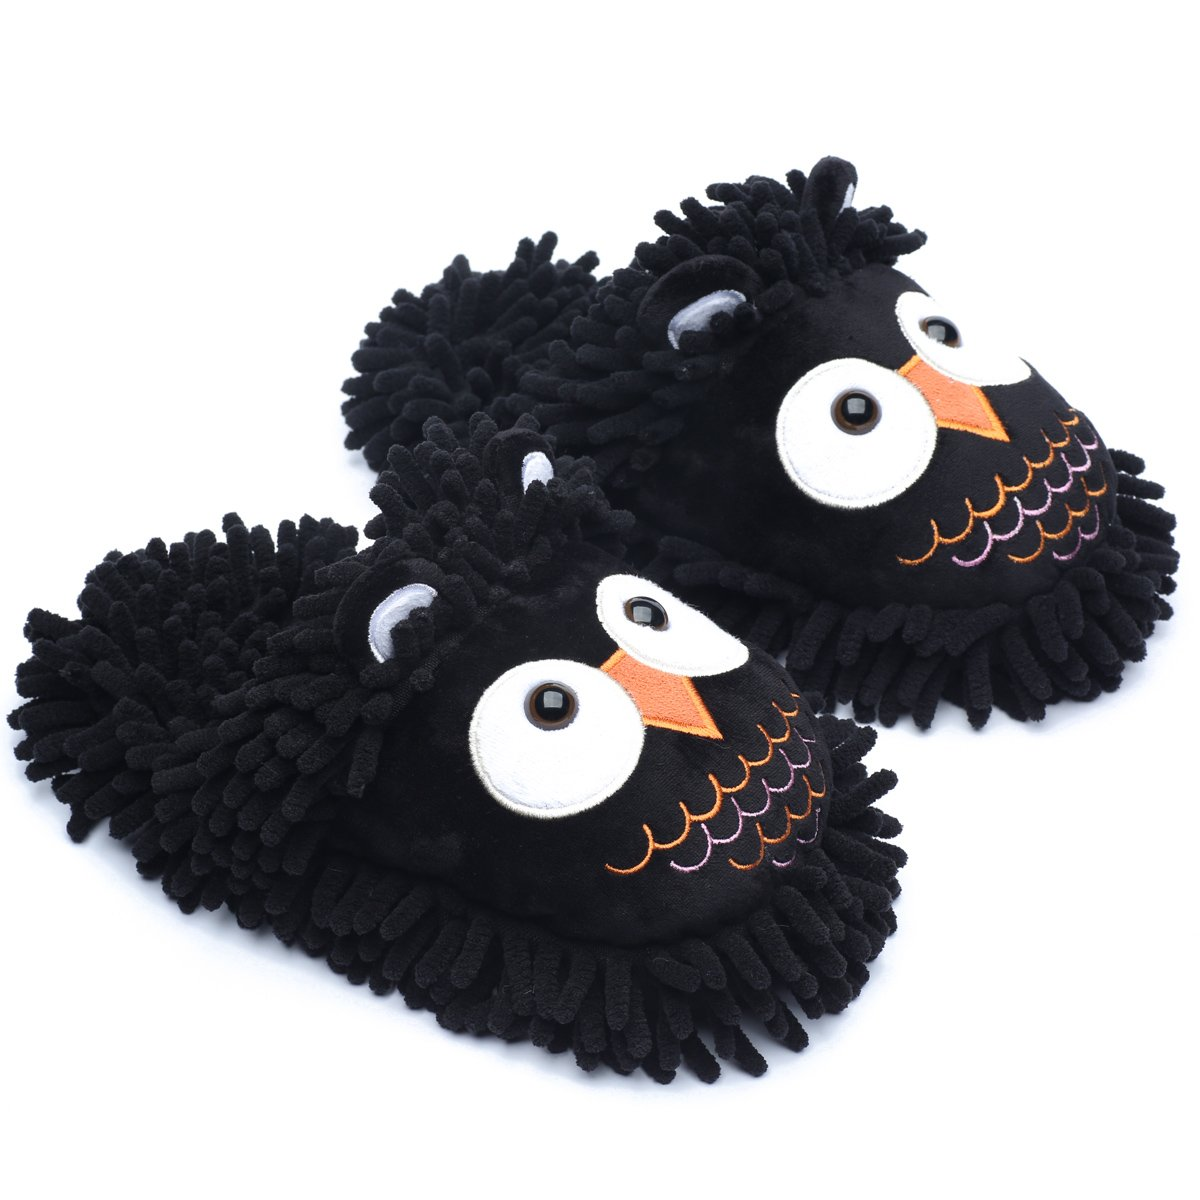 Ofoot Winter Warm Plush Anti-slip Indoor Animal Slippers for Women and Men (M/L 8-10 B(M) US, Black(Owl))